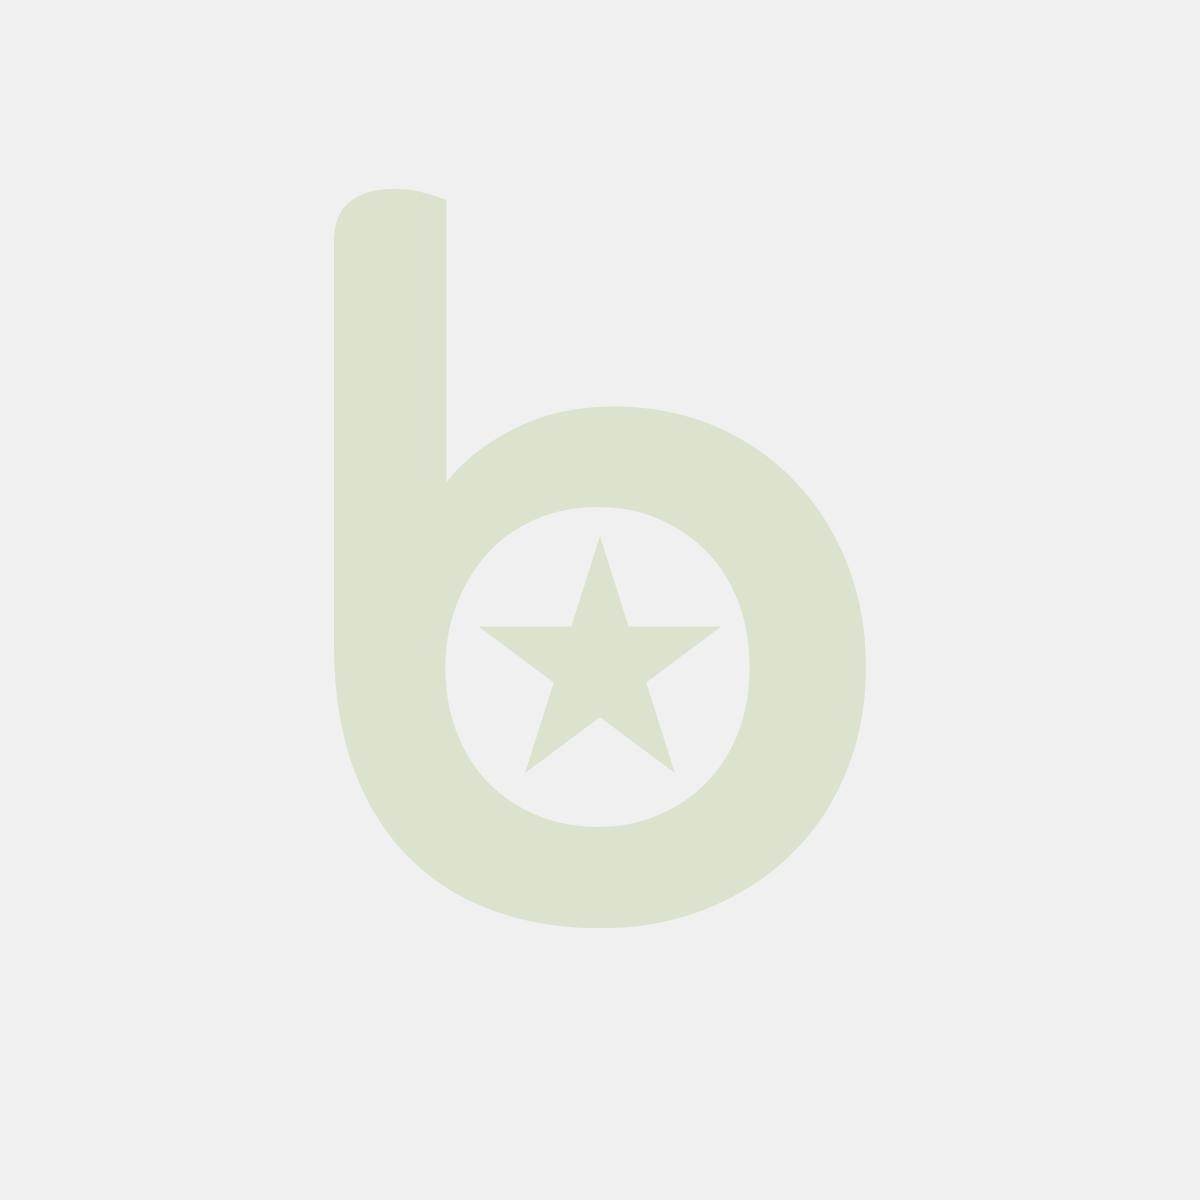 Obrus Soft Selection 240x140 c.niebieski włóknina PP op. 1 rolka